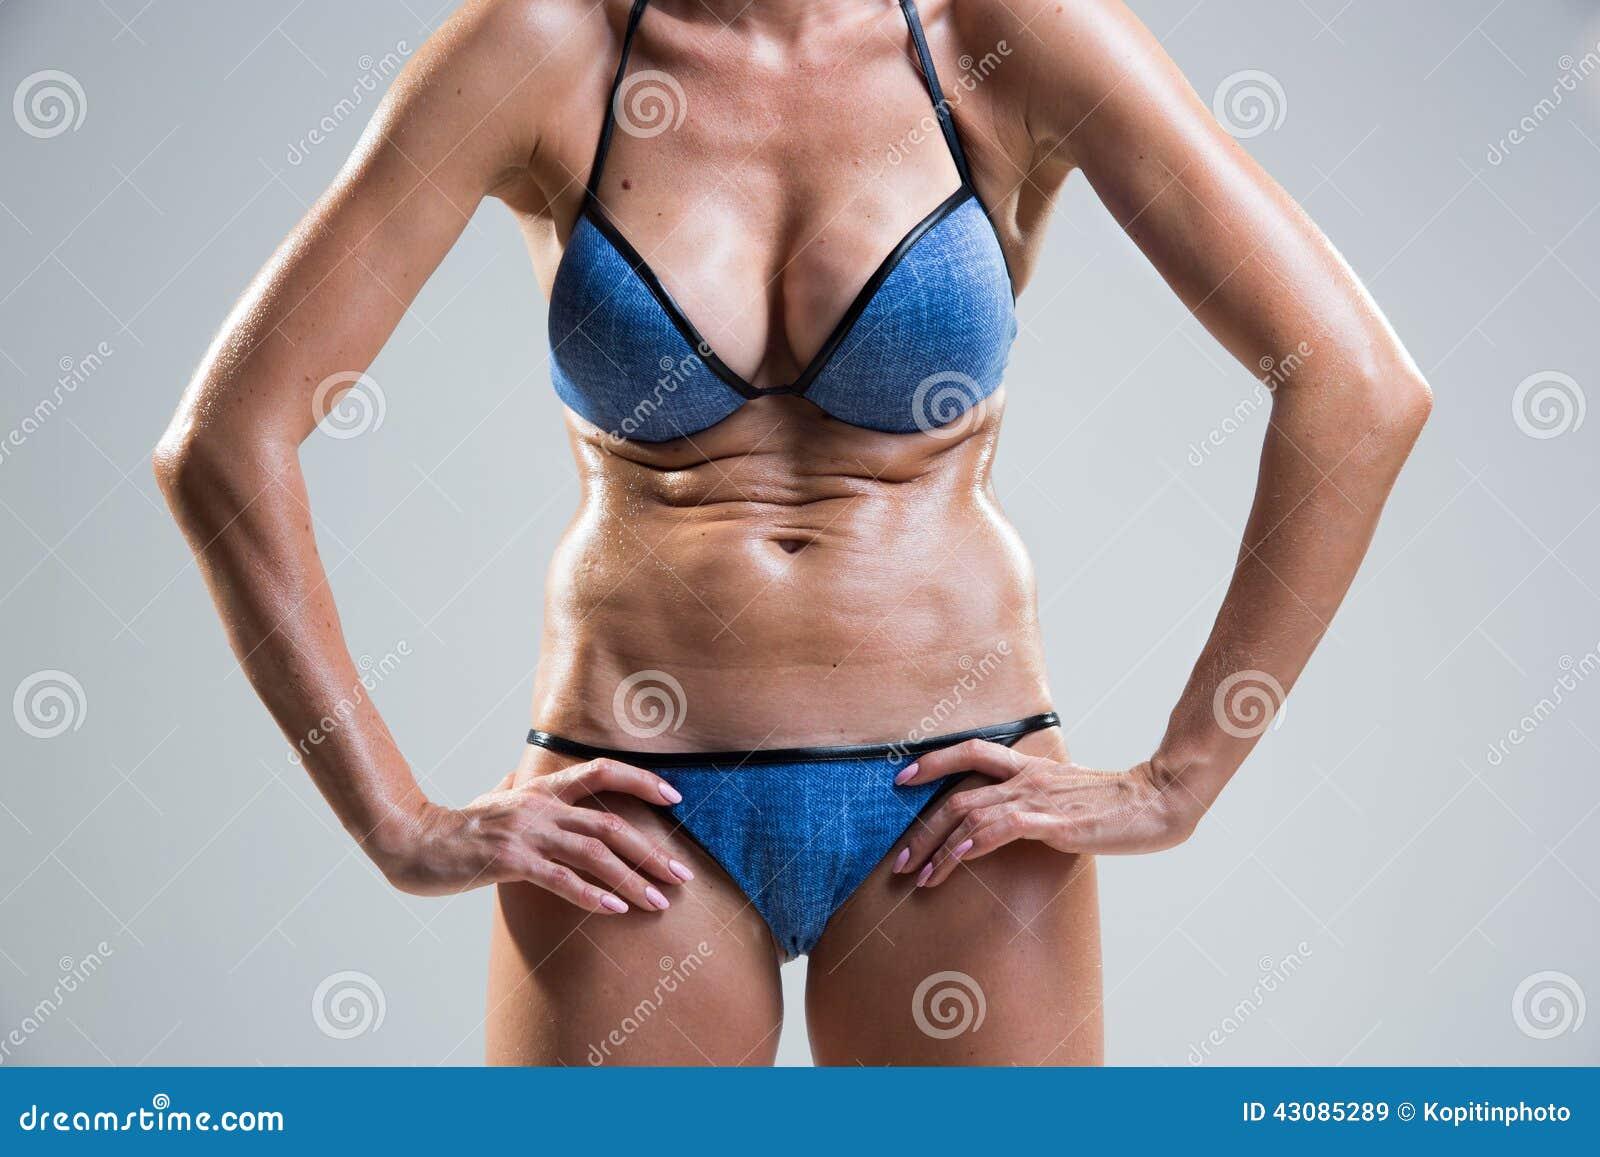 Tummy Cellulite Poor Posture Stock Image Image Of Bikini Tummy 43085289